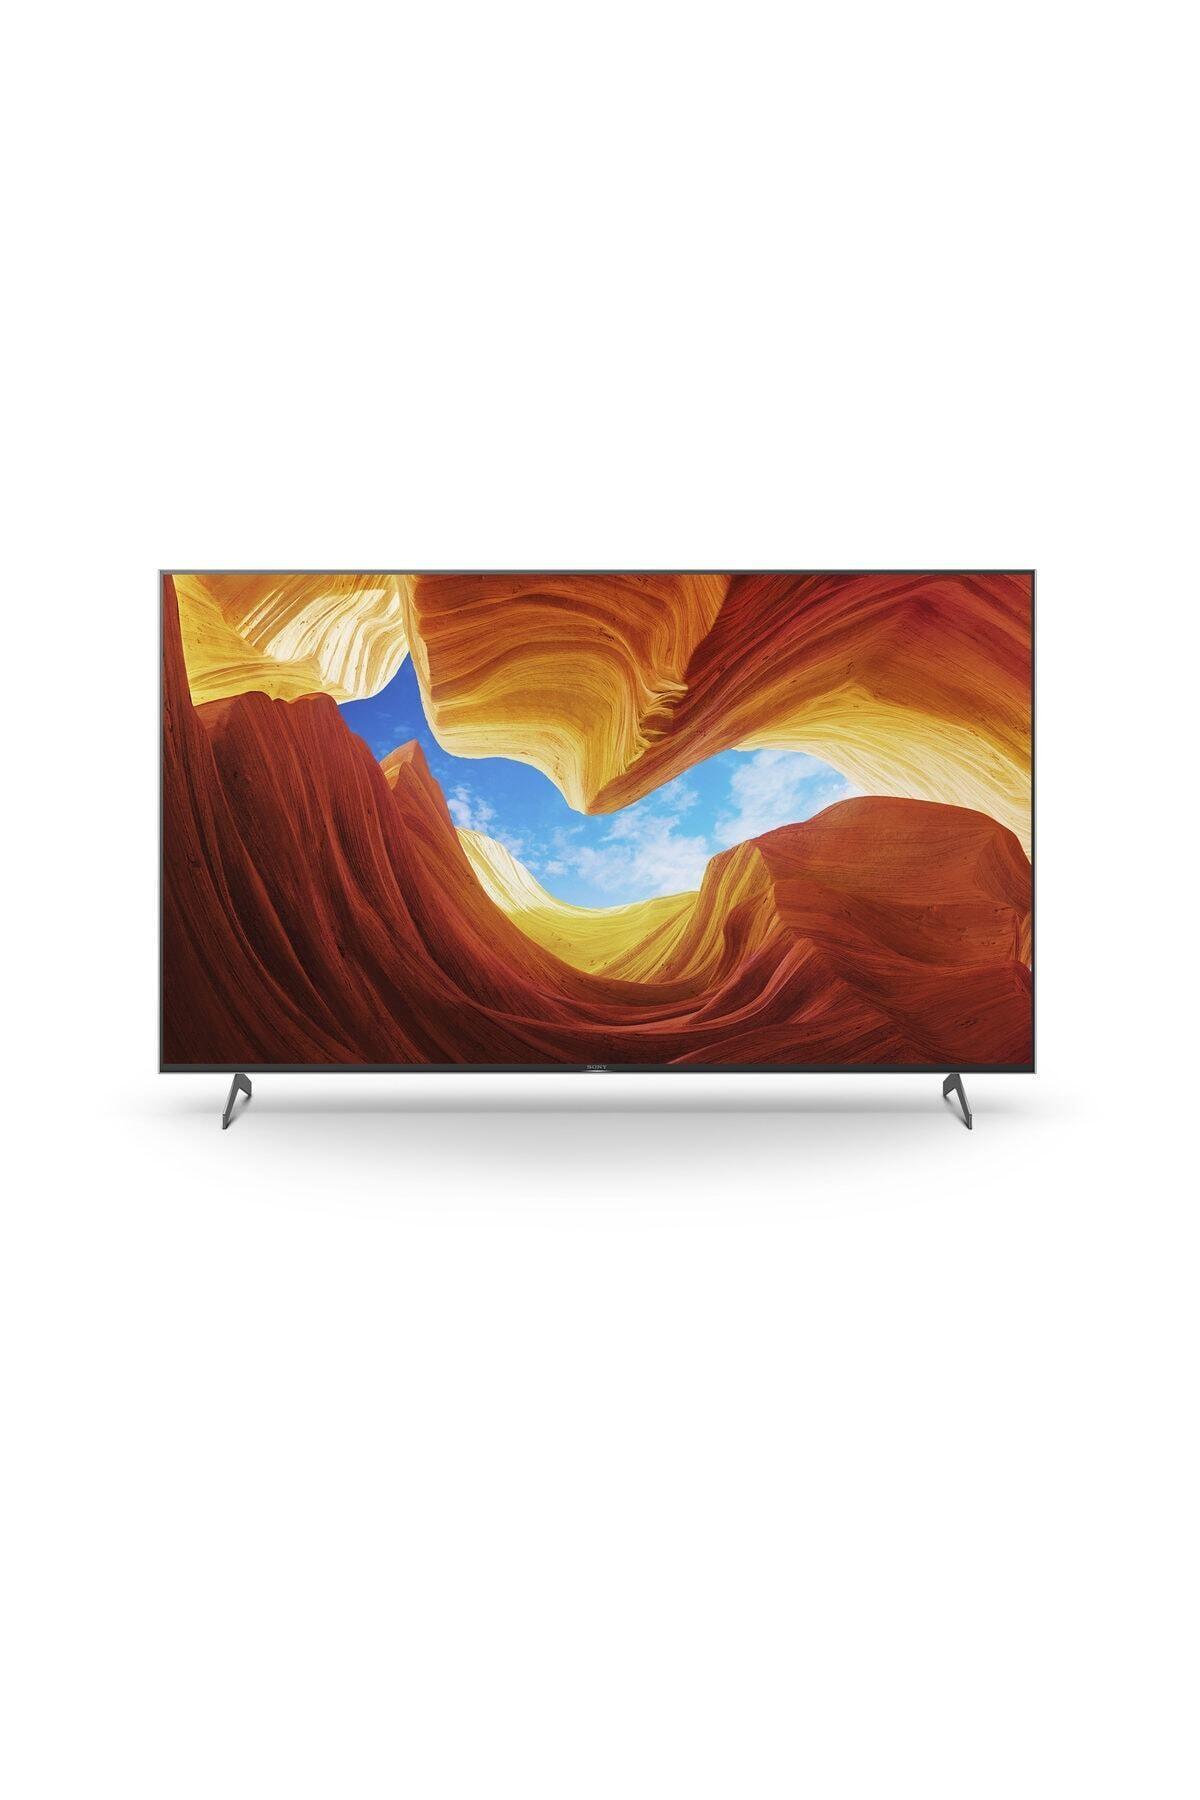 "KD-65XH9096 65"" 165 Ekran Uydu Alıcılı 4K Ultra HD Smart LED TV"